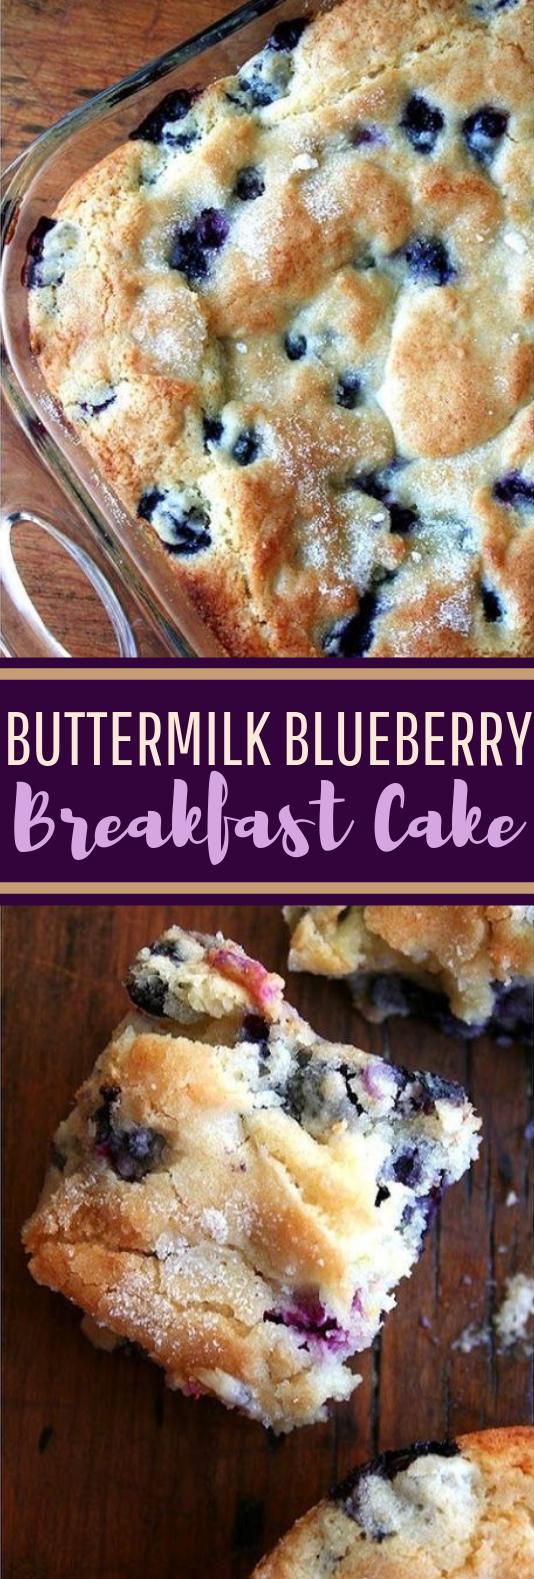 Buttermilk Blueberry Breakfast Cake #cake #baking #buttermilkblueberrybreakfastcake